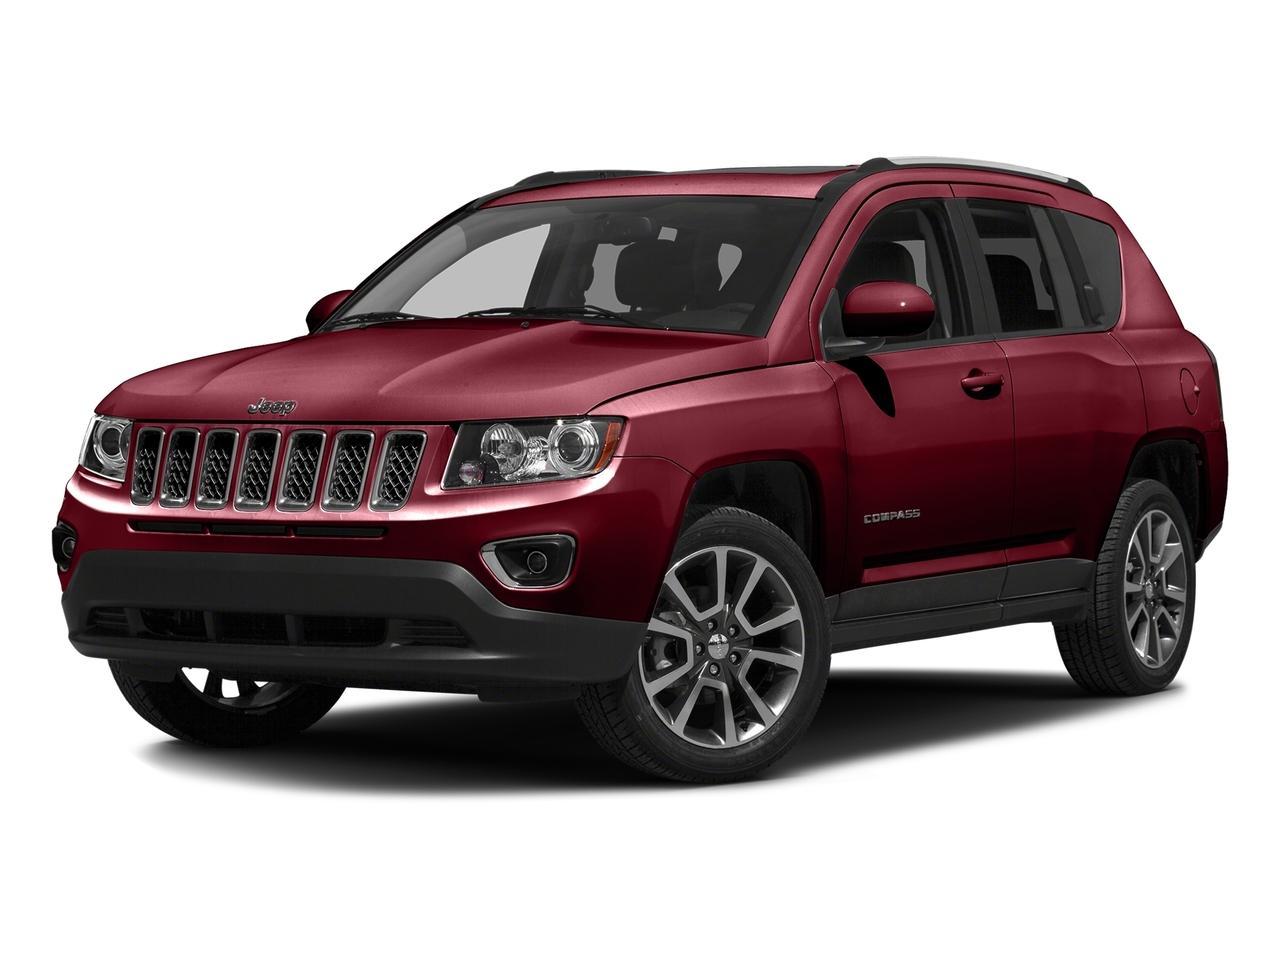 2016 Jeep Compass Vehicle Photo in Tucson, AZ 85711